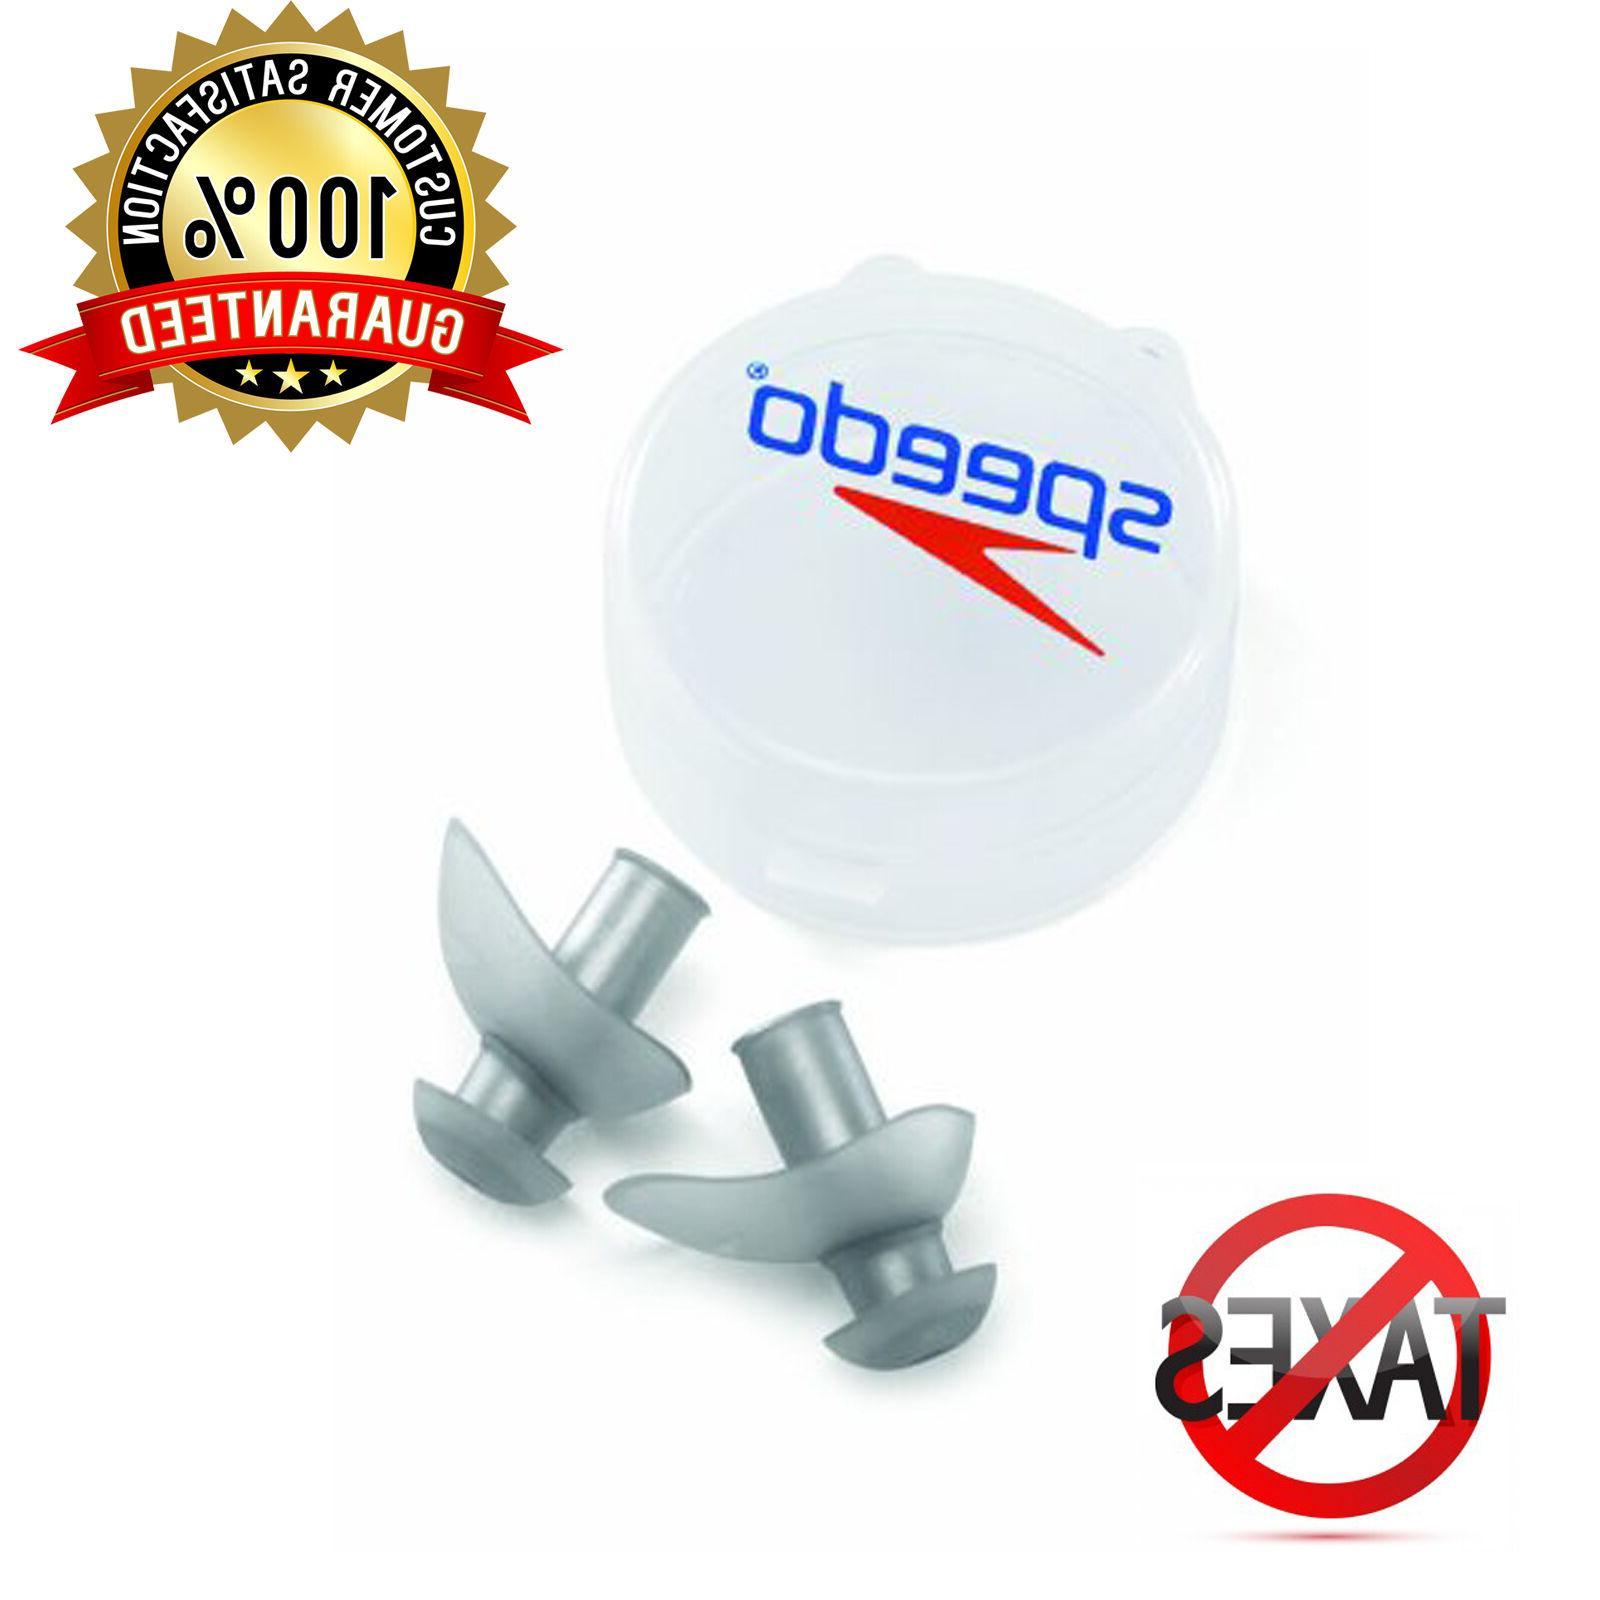 swimming ergo ear plugs water earplugs set